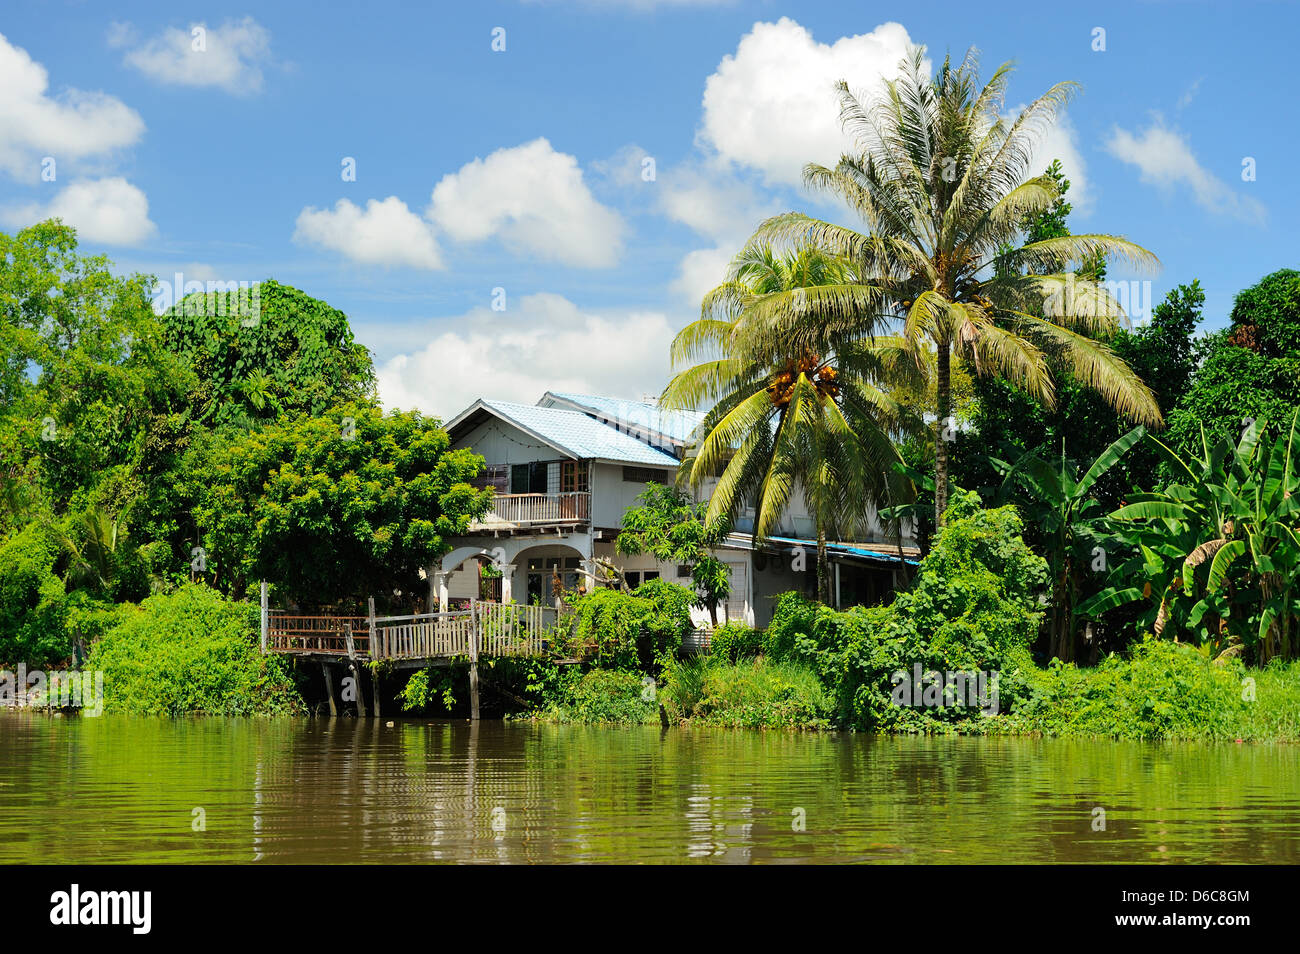 Waterside residence on the Sungai Sarawak River in Kuching, Sarawak, Borneo - Stock Image